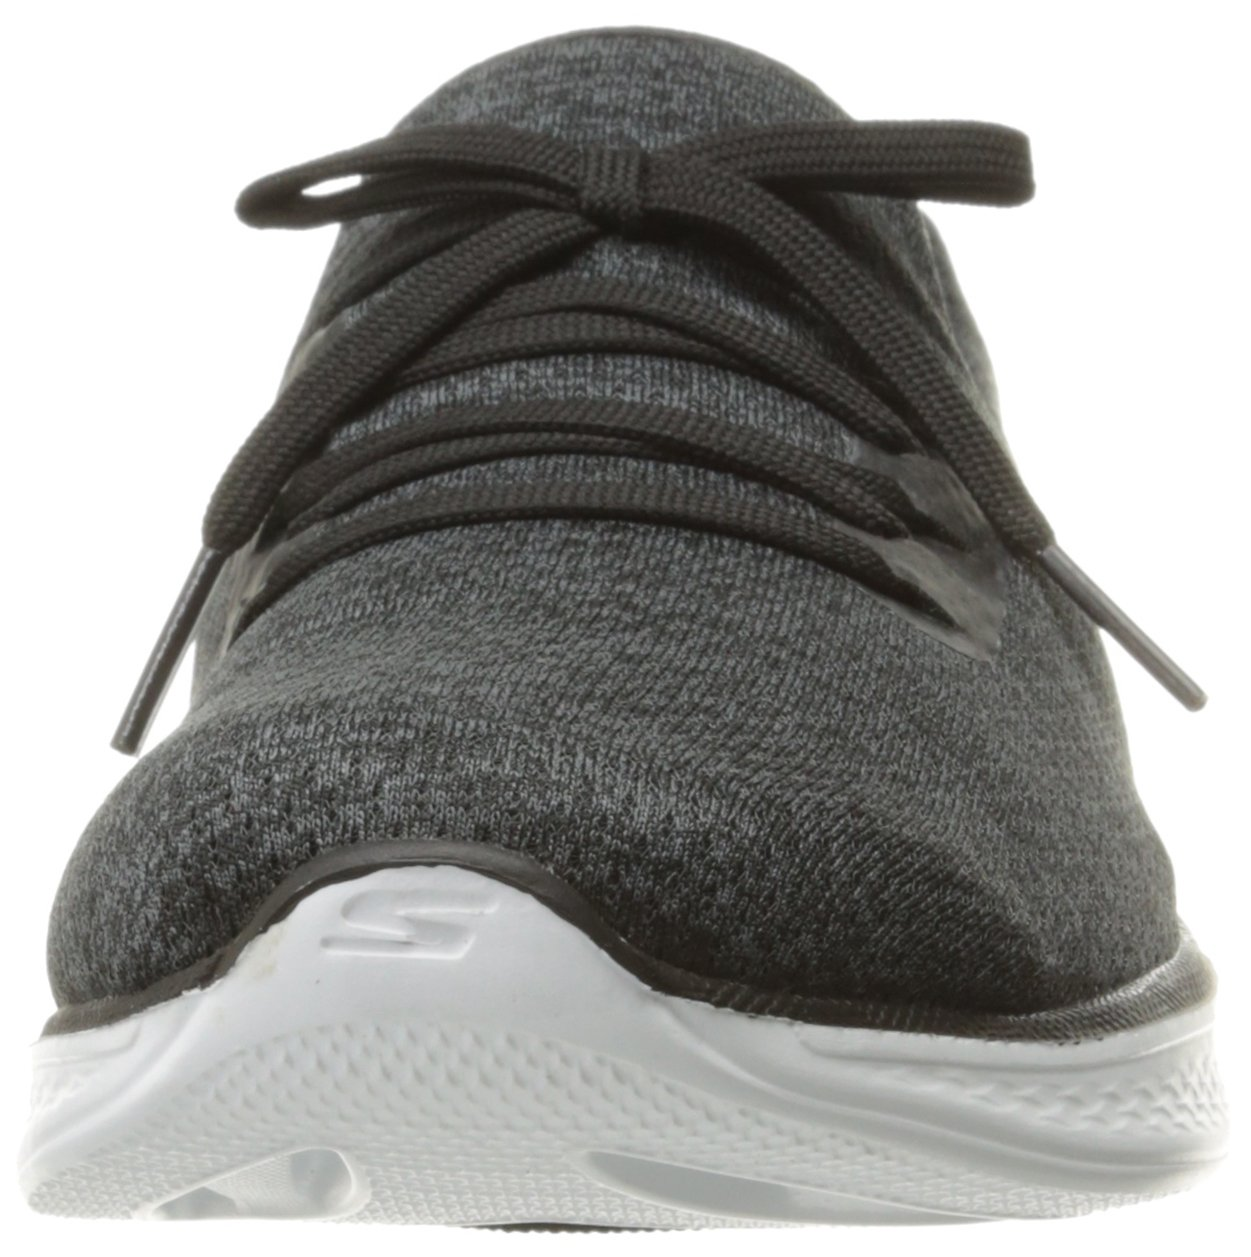 Skechers Performance Women's Go Walk 4 A.D.C. All Day Comfort Walking Shoe B01J2NXQ5G 11 B(M) US|Black/White